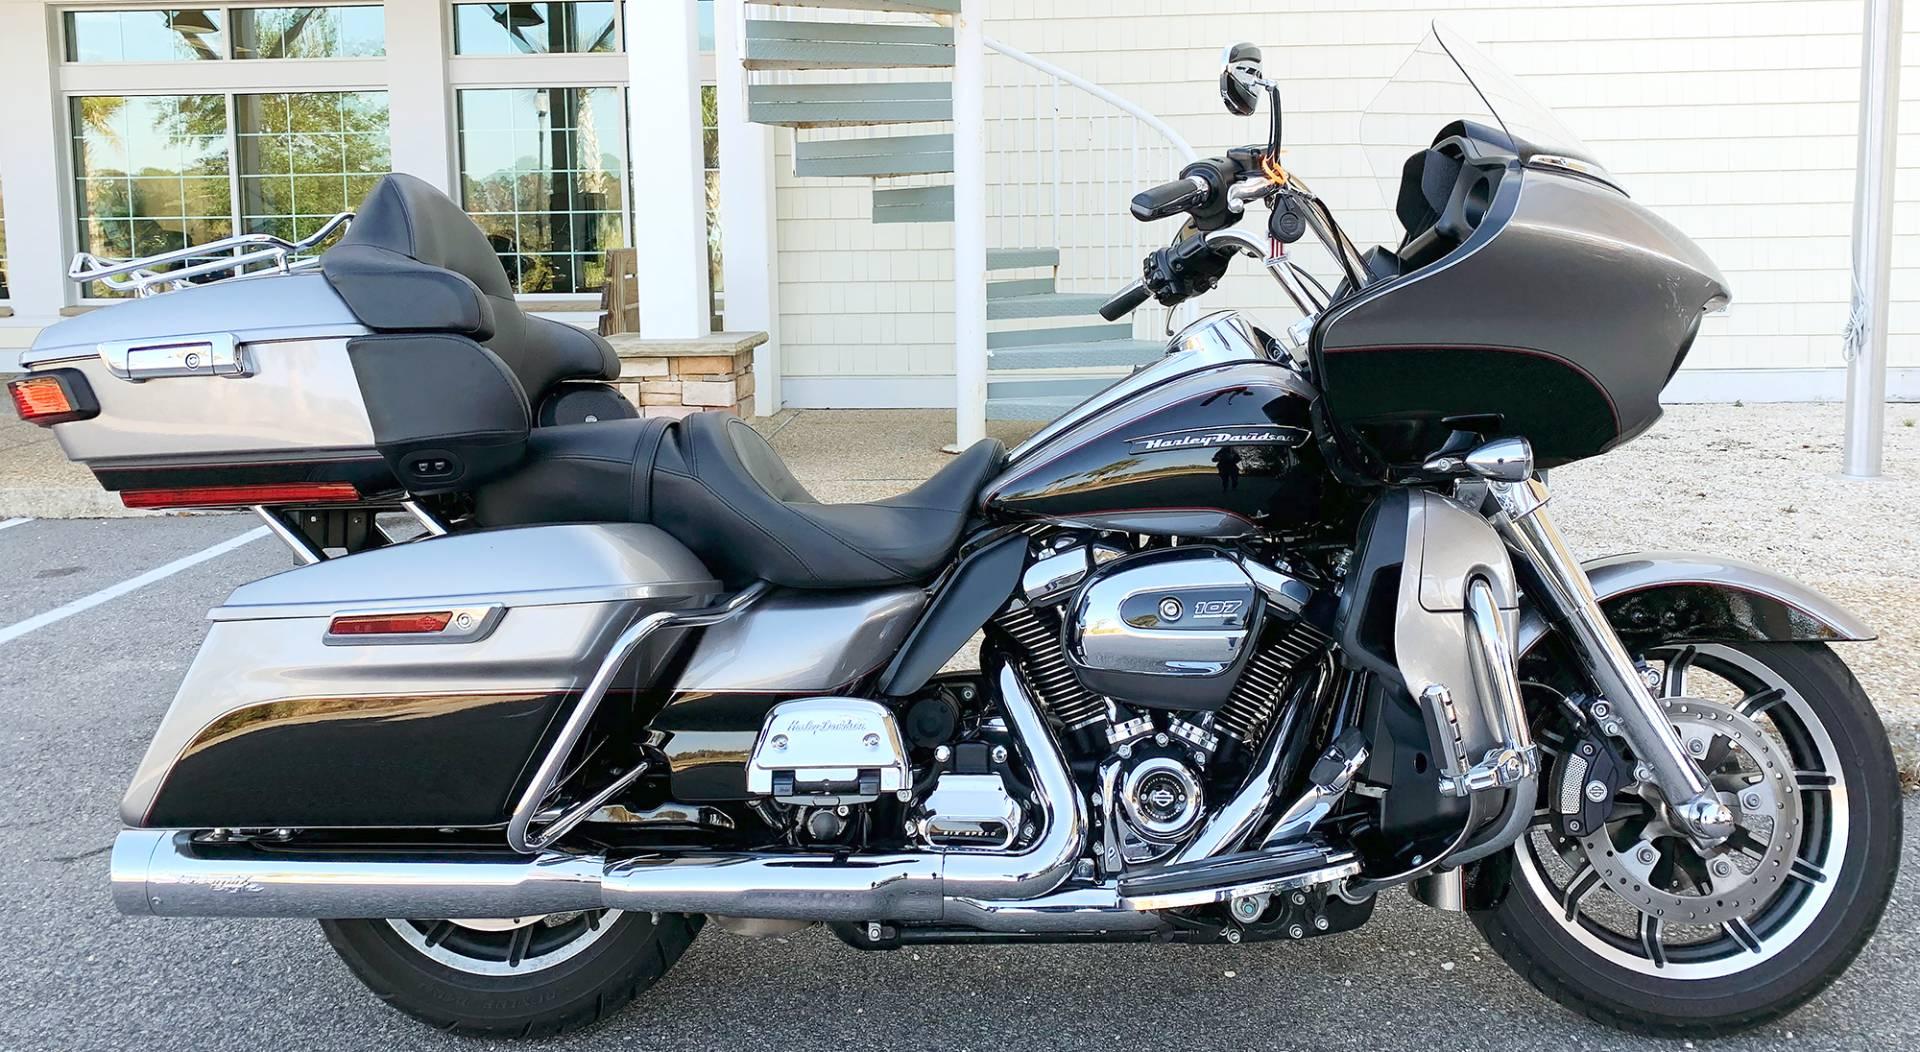 2017 Road Glide Ultra >> 2017 Harley Davidson Road Glide Ultra In Shallotte North Carolina